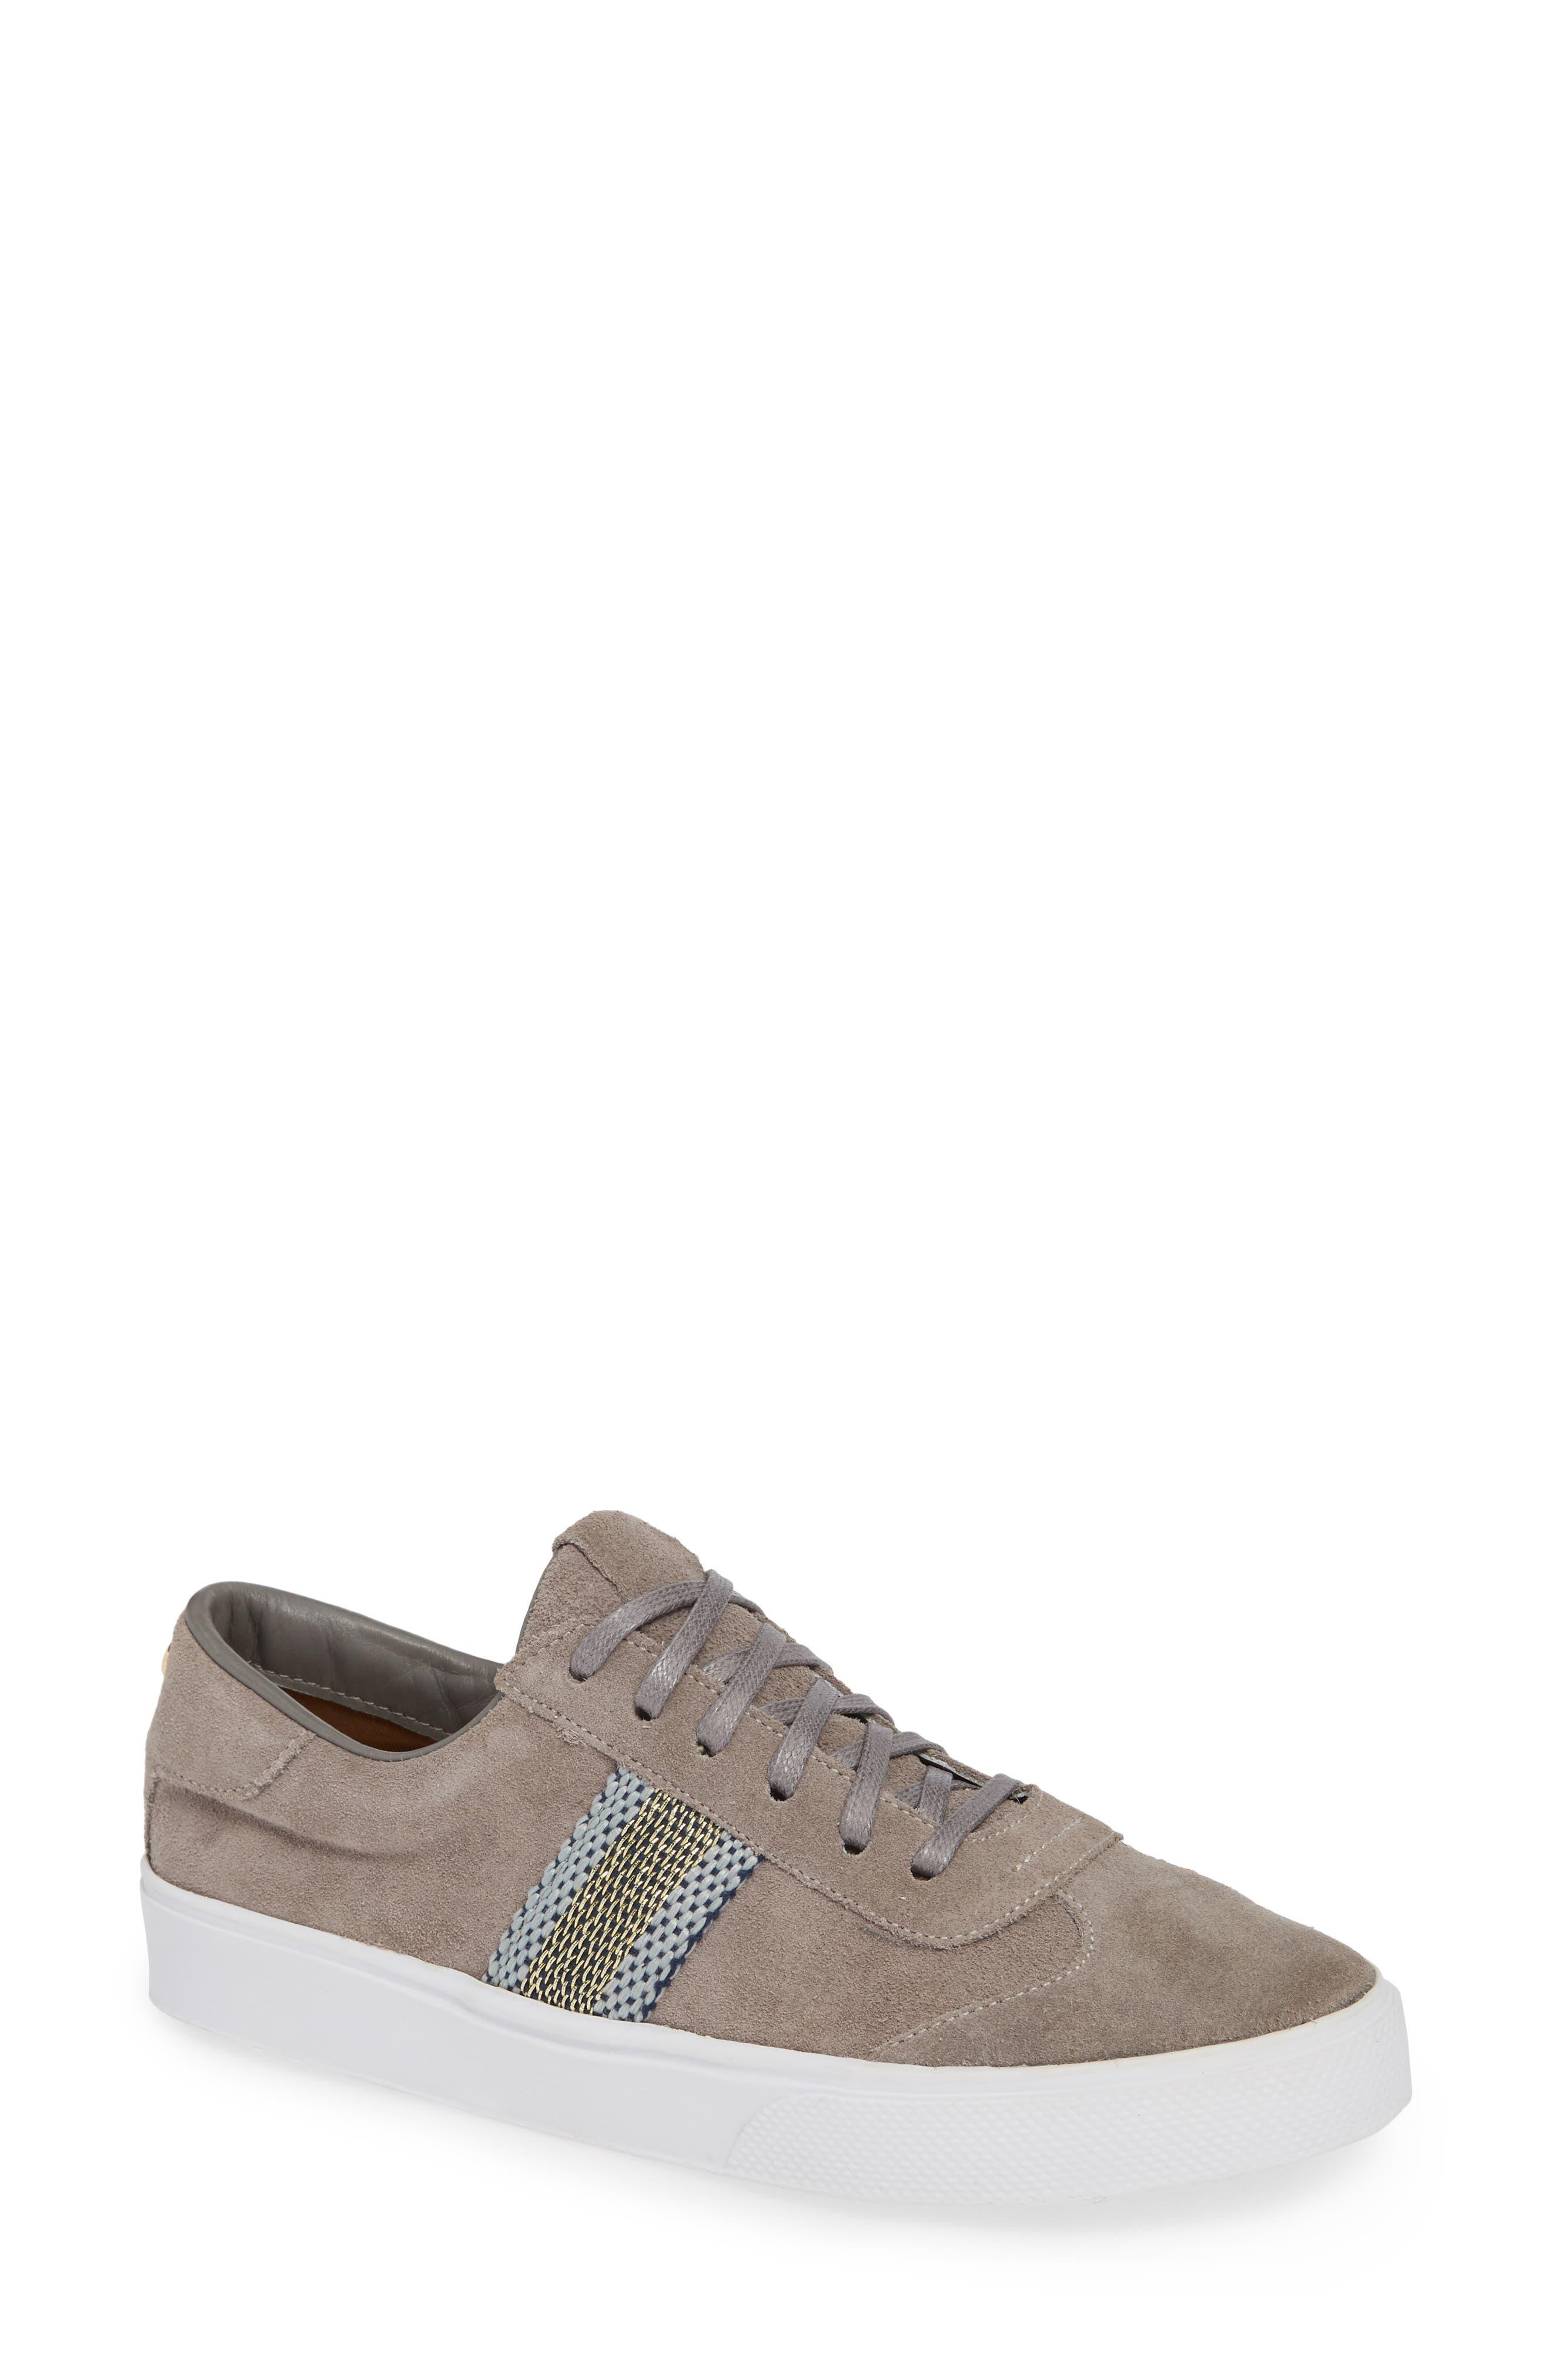 KAANAS Perugia Sneaker in Grey